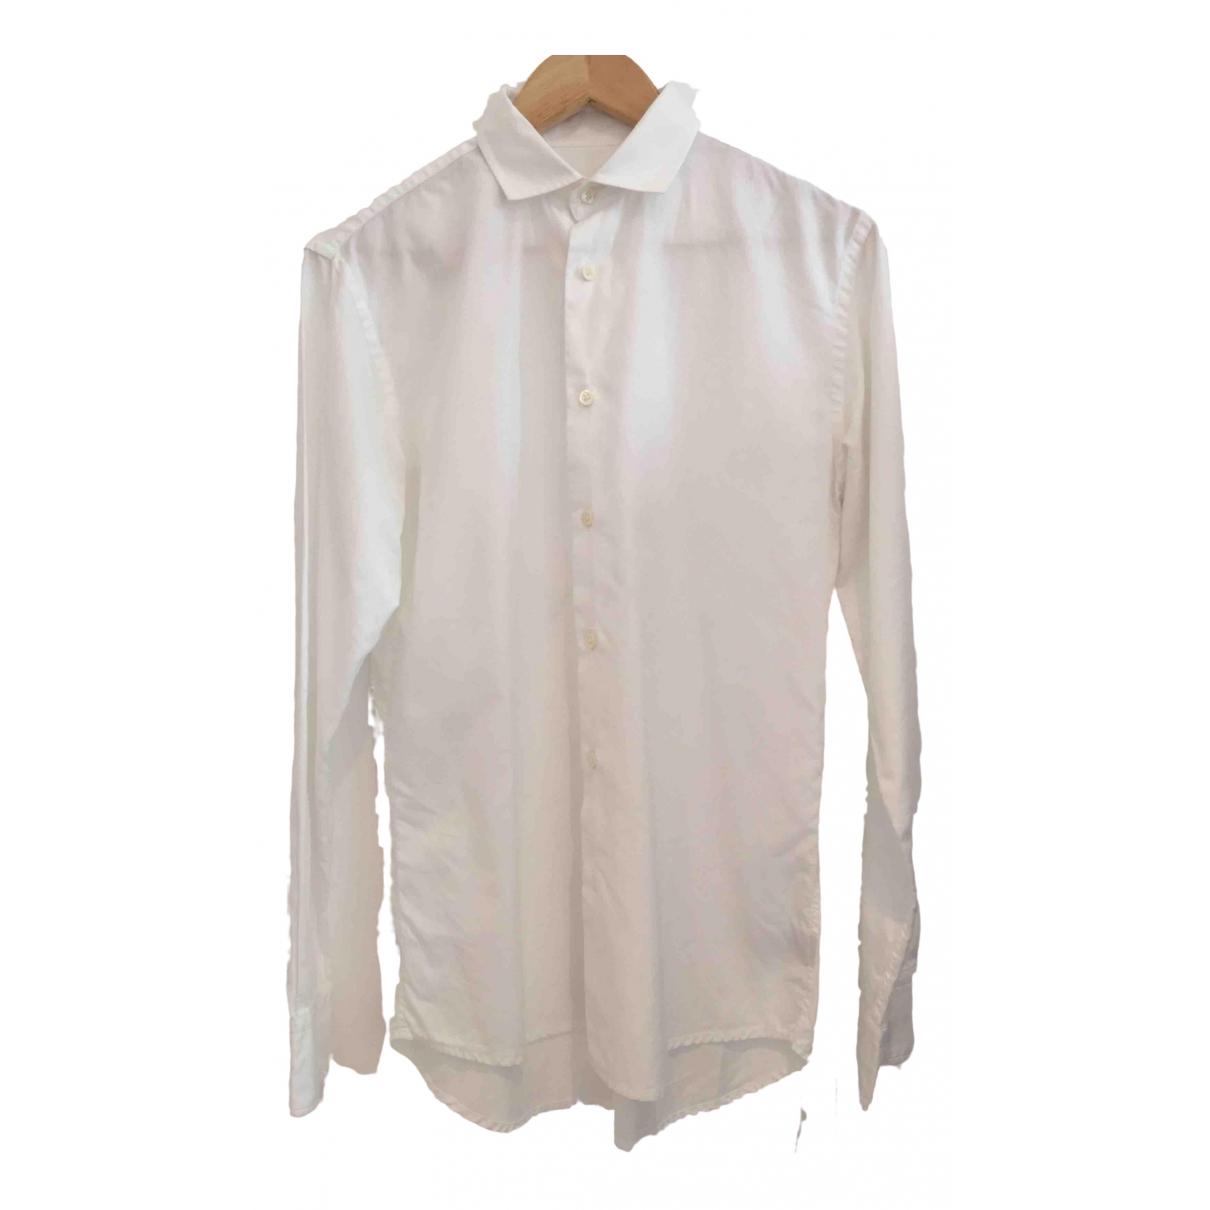 Bottega Veneta \N White Cotton Shirts for Men 38 EU (tour de cou / collar)